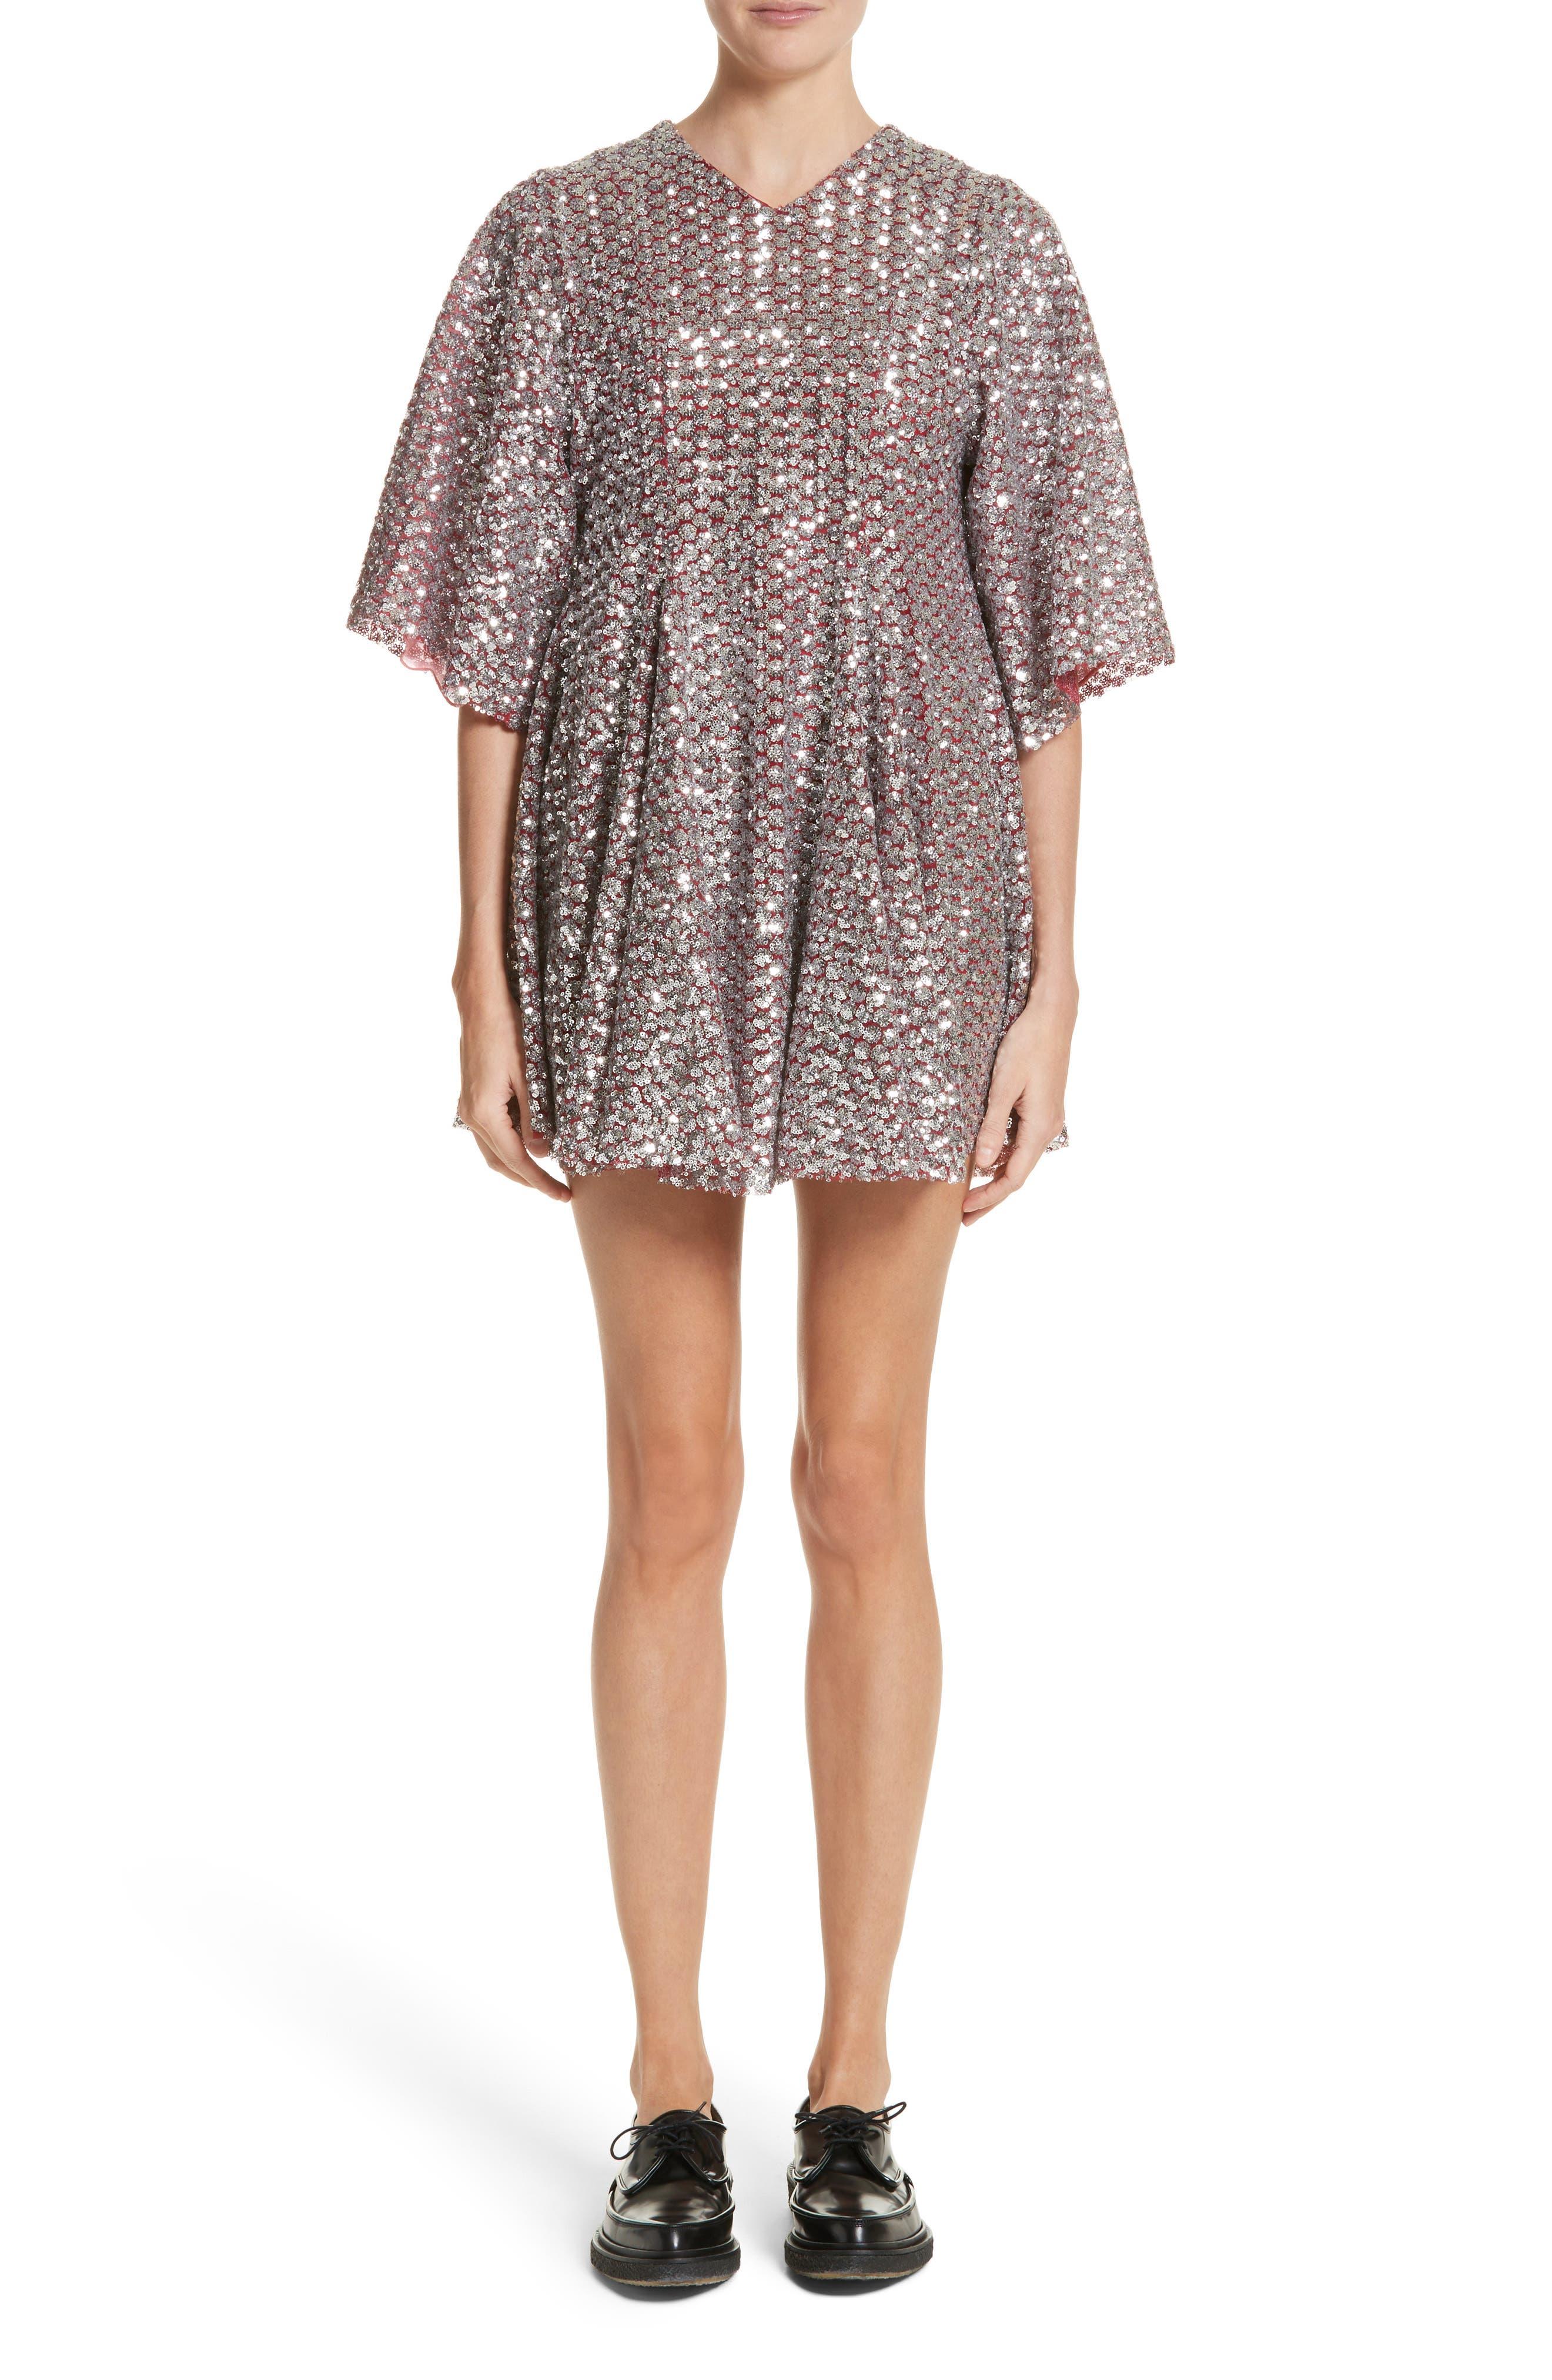 Simmi Sequin Dress,                             Main thumbnail 1, color,                             040